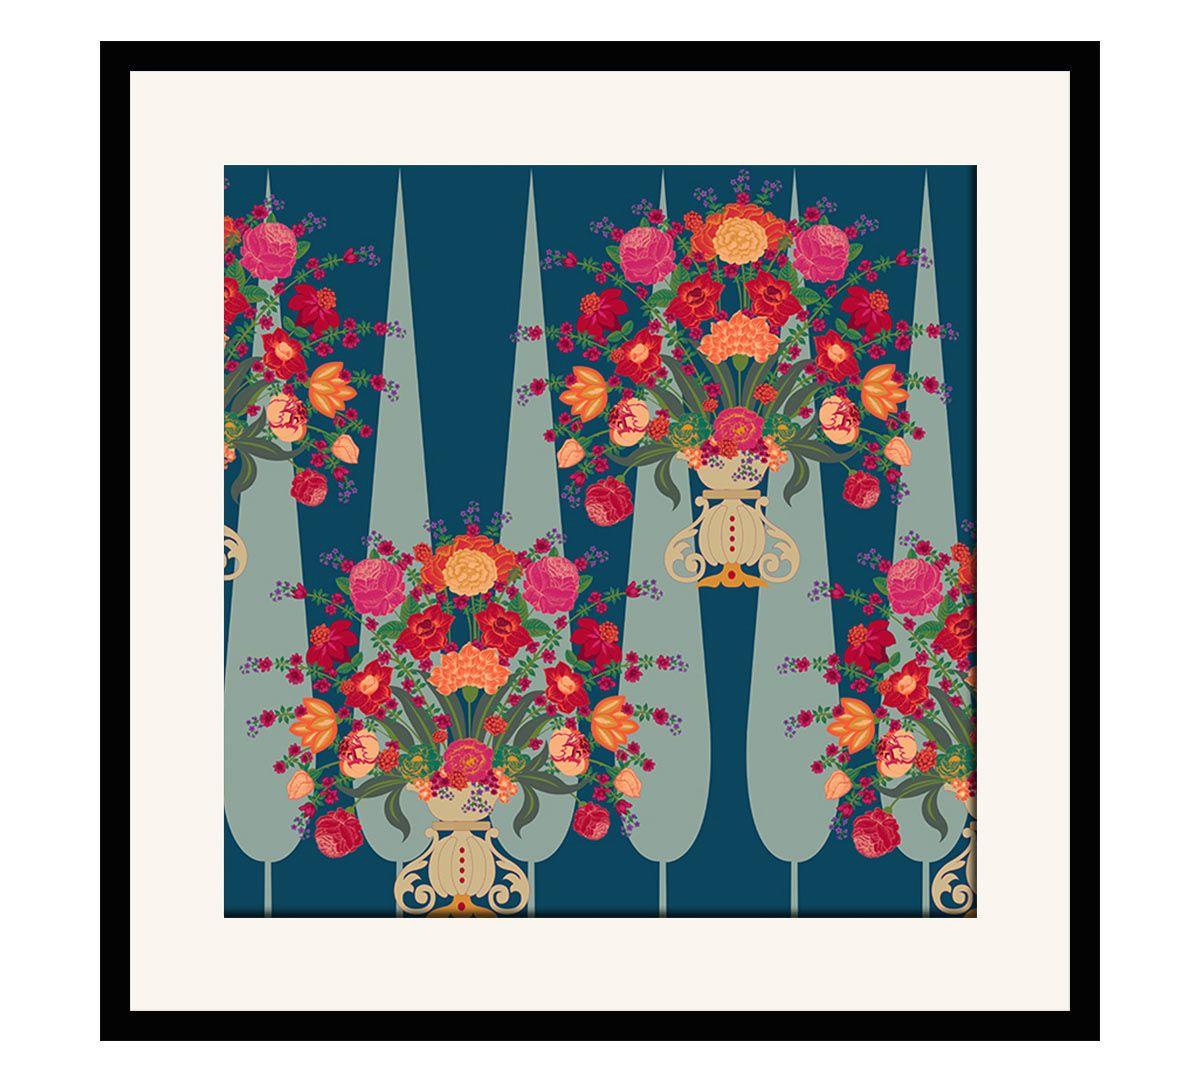 India Circus Conifer Affair 16 x 16 and 24 x 24 Framed Wall Art